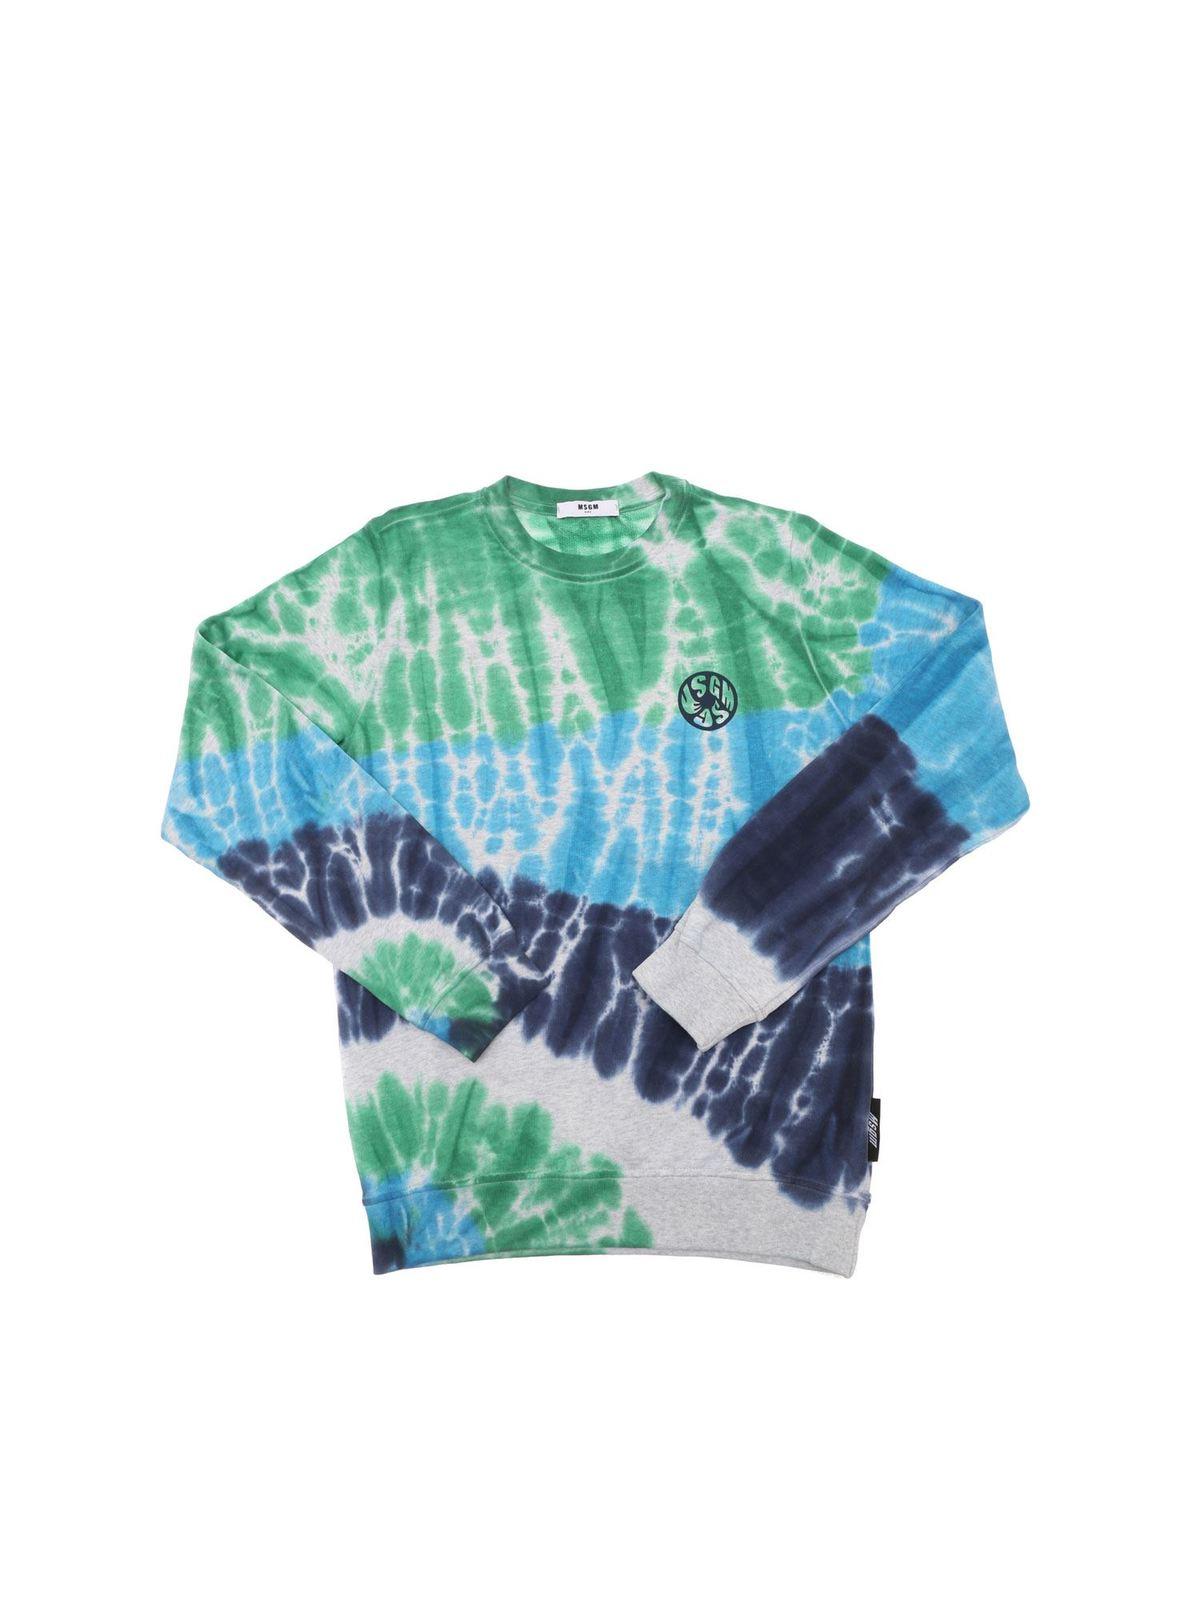 Msgm Sweatshirts TIE-DYE SWEATSHIRT IN GREY BLUE AND GREEN